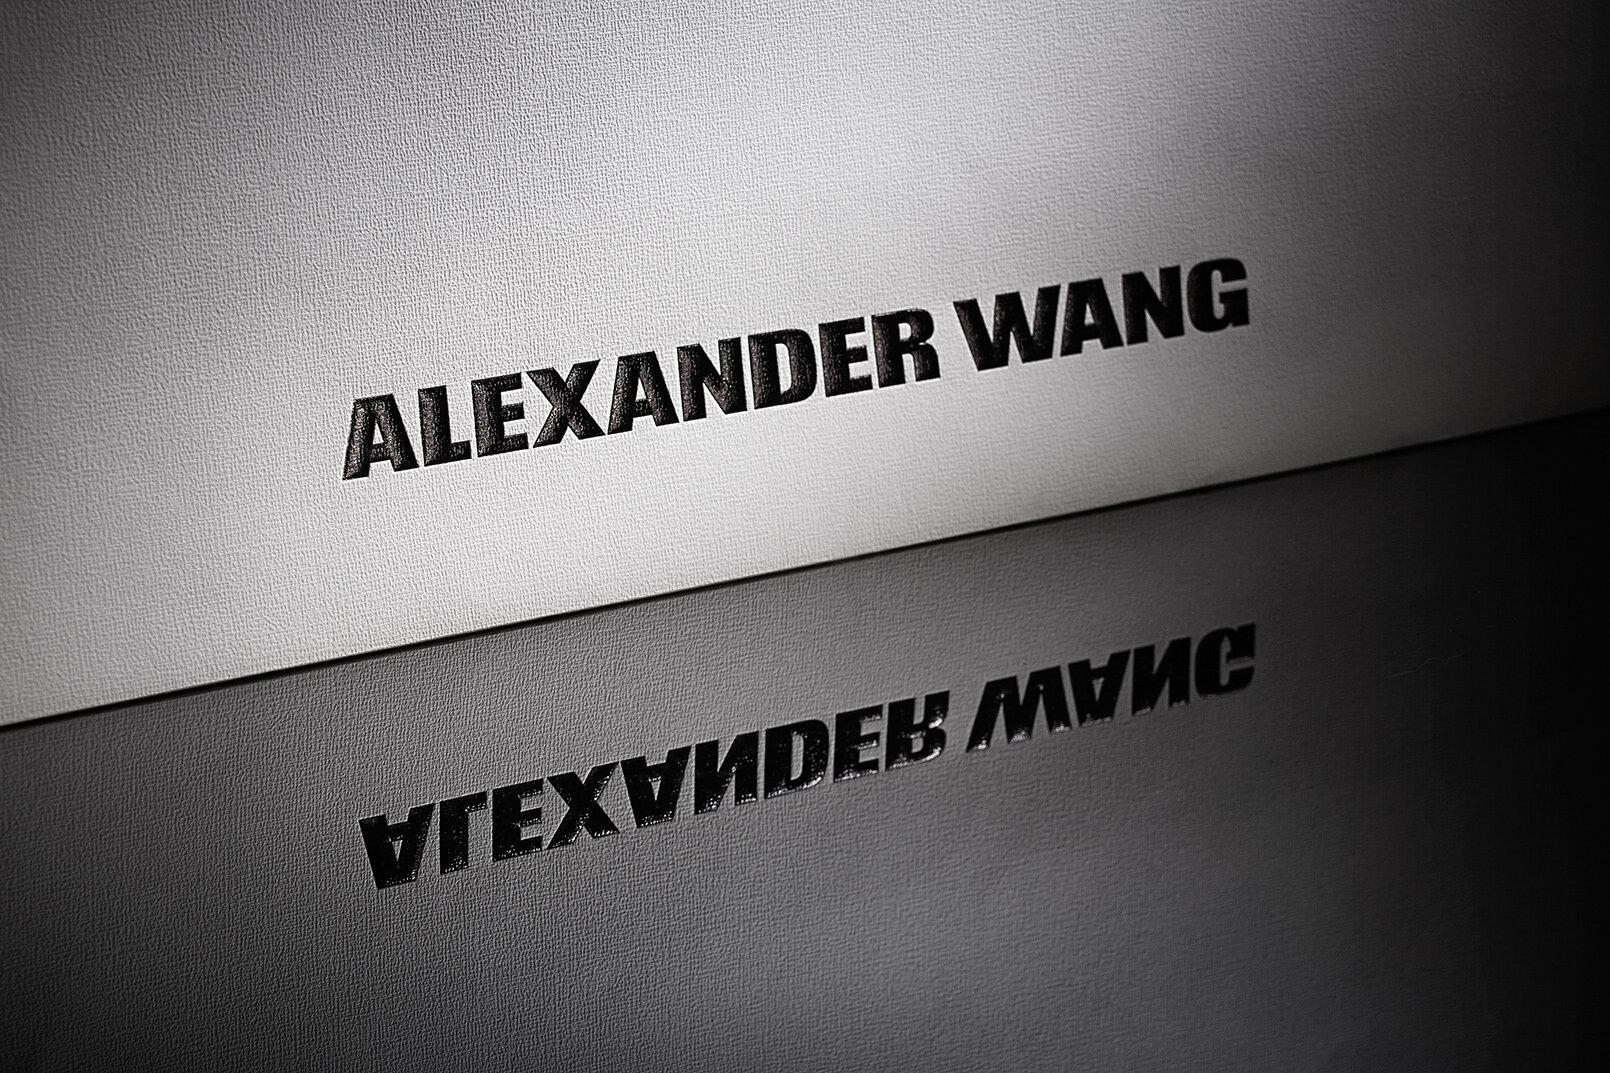 Alexander-Wang-Box-Design-Packaging-Company-2.JPG